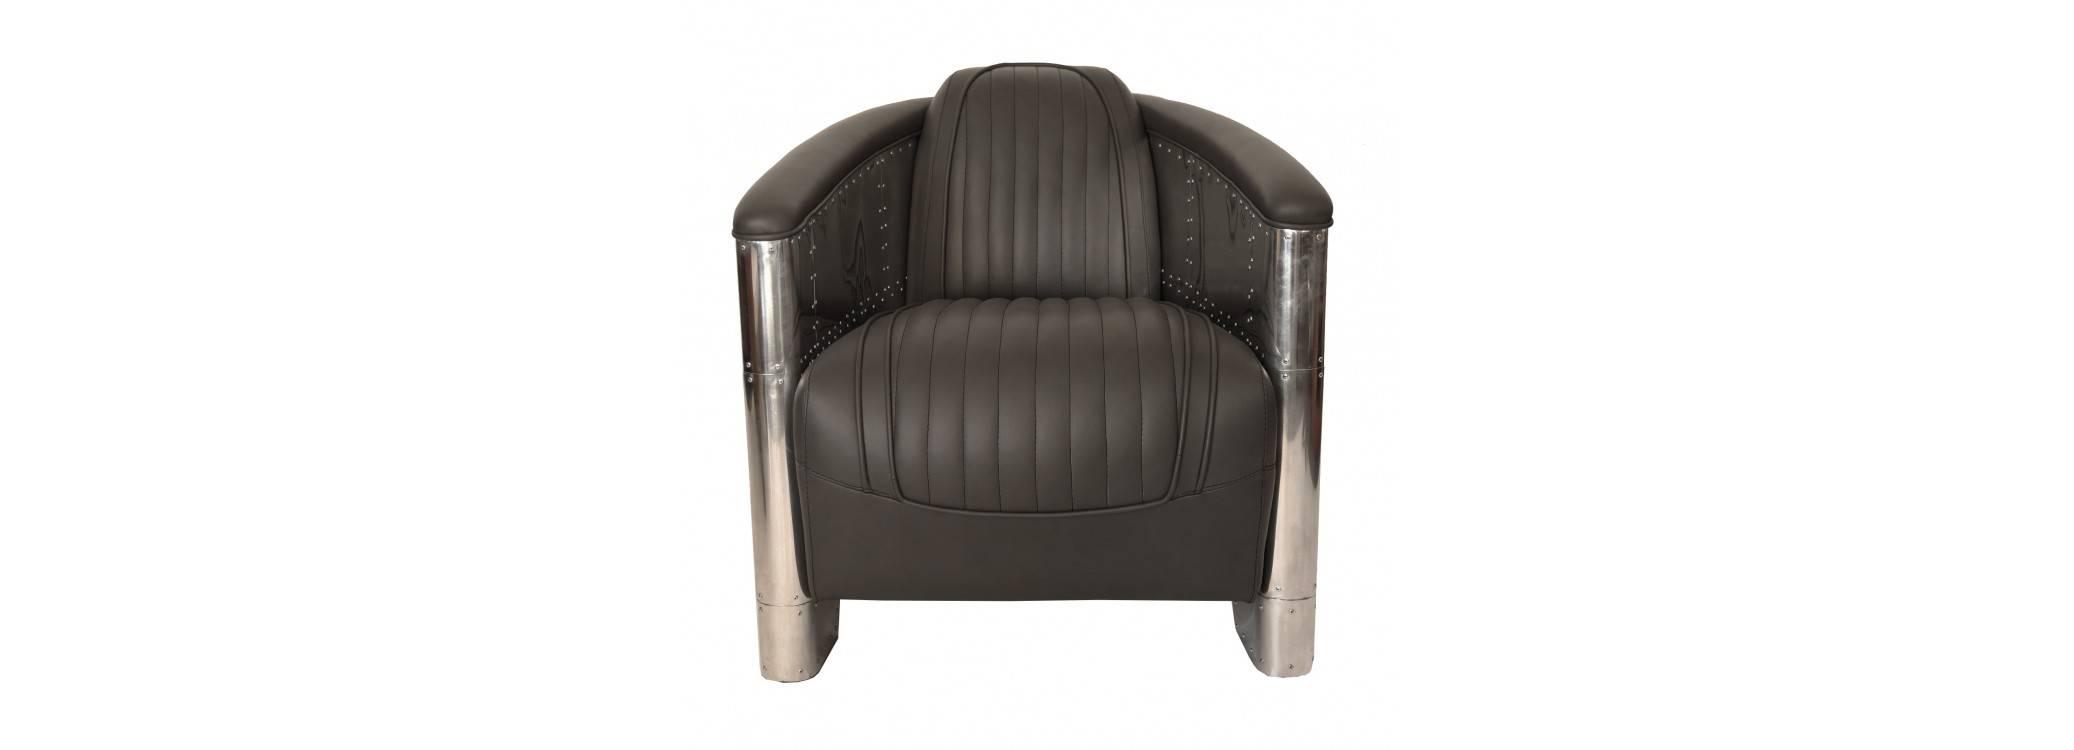 Aviator armchair - Grey leather